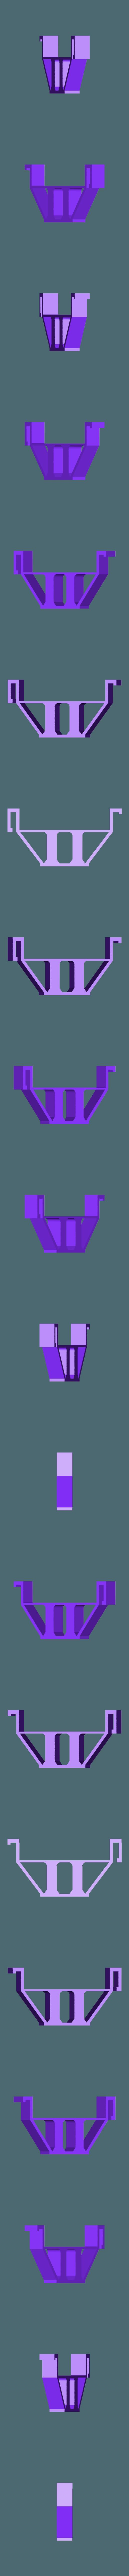 TruckV3_cab_batt_hold.STL Download STL file 3D Printed RC Truck V3 • 3D print model, MrCrankyface